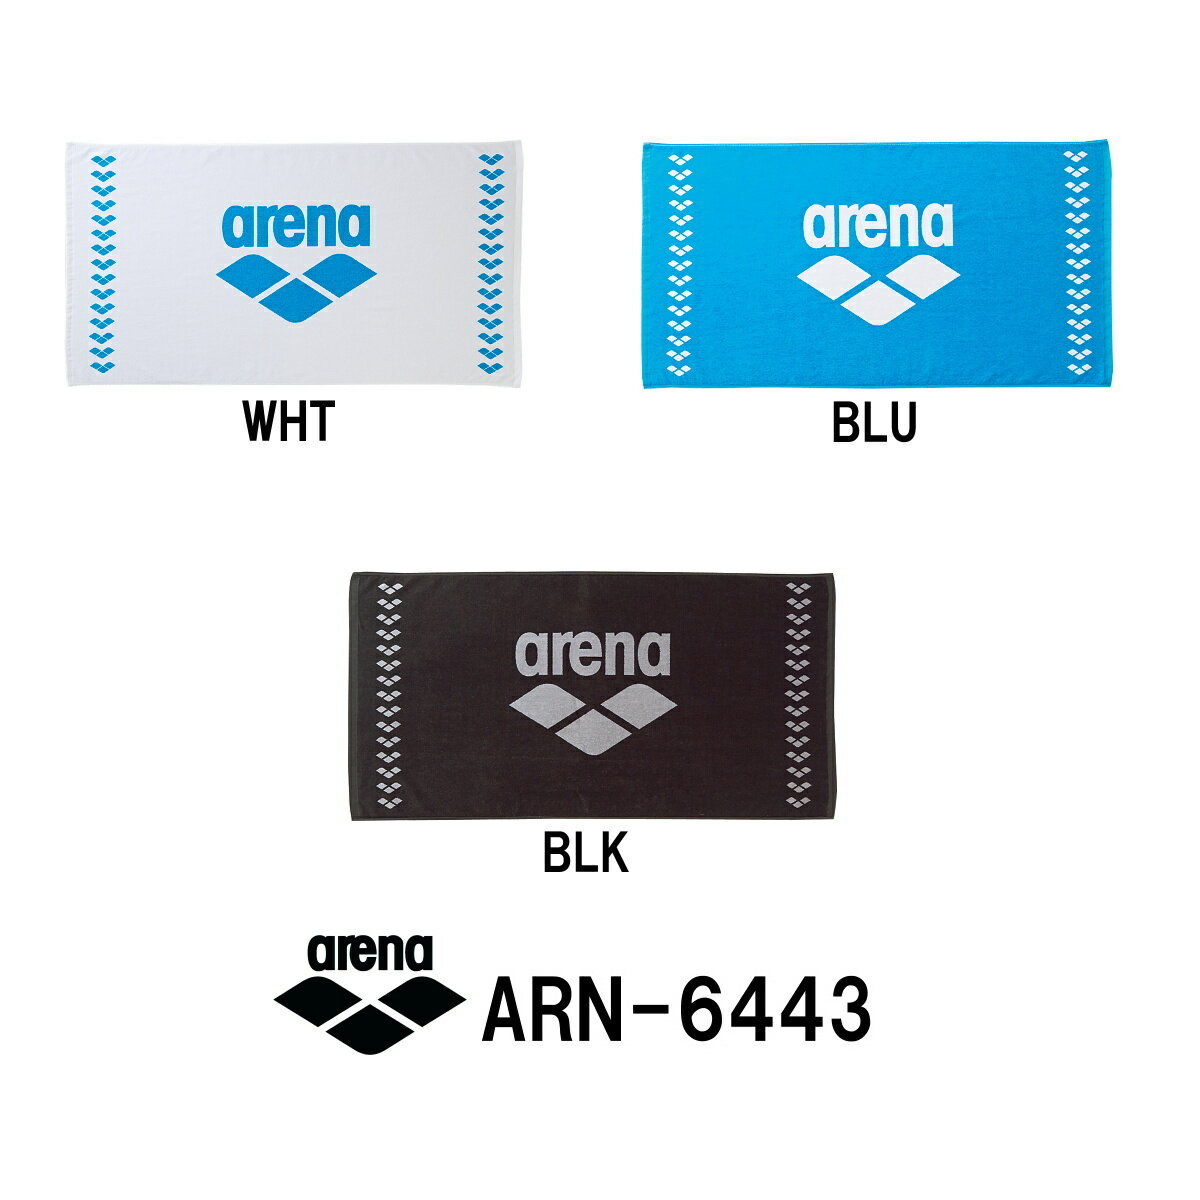 ARENA アリーナ バスタオル ARN-6443